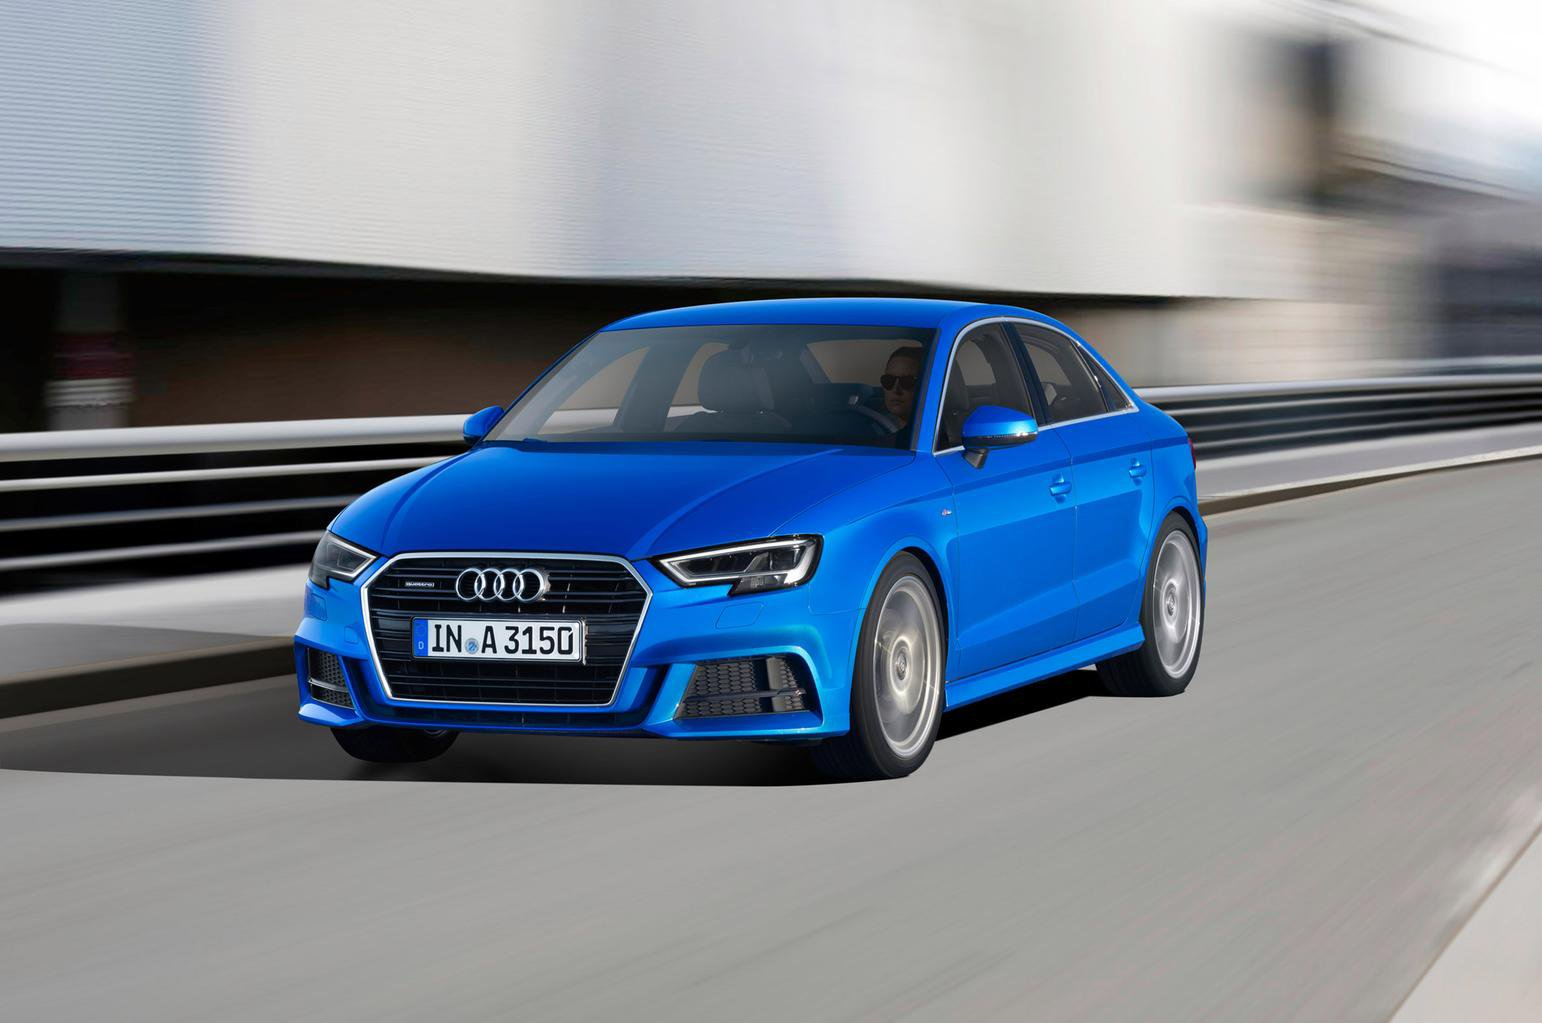 2016 Audi A3 facelift revealed